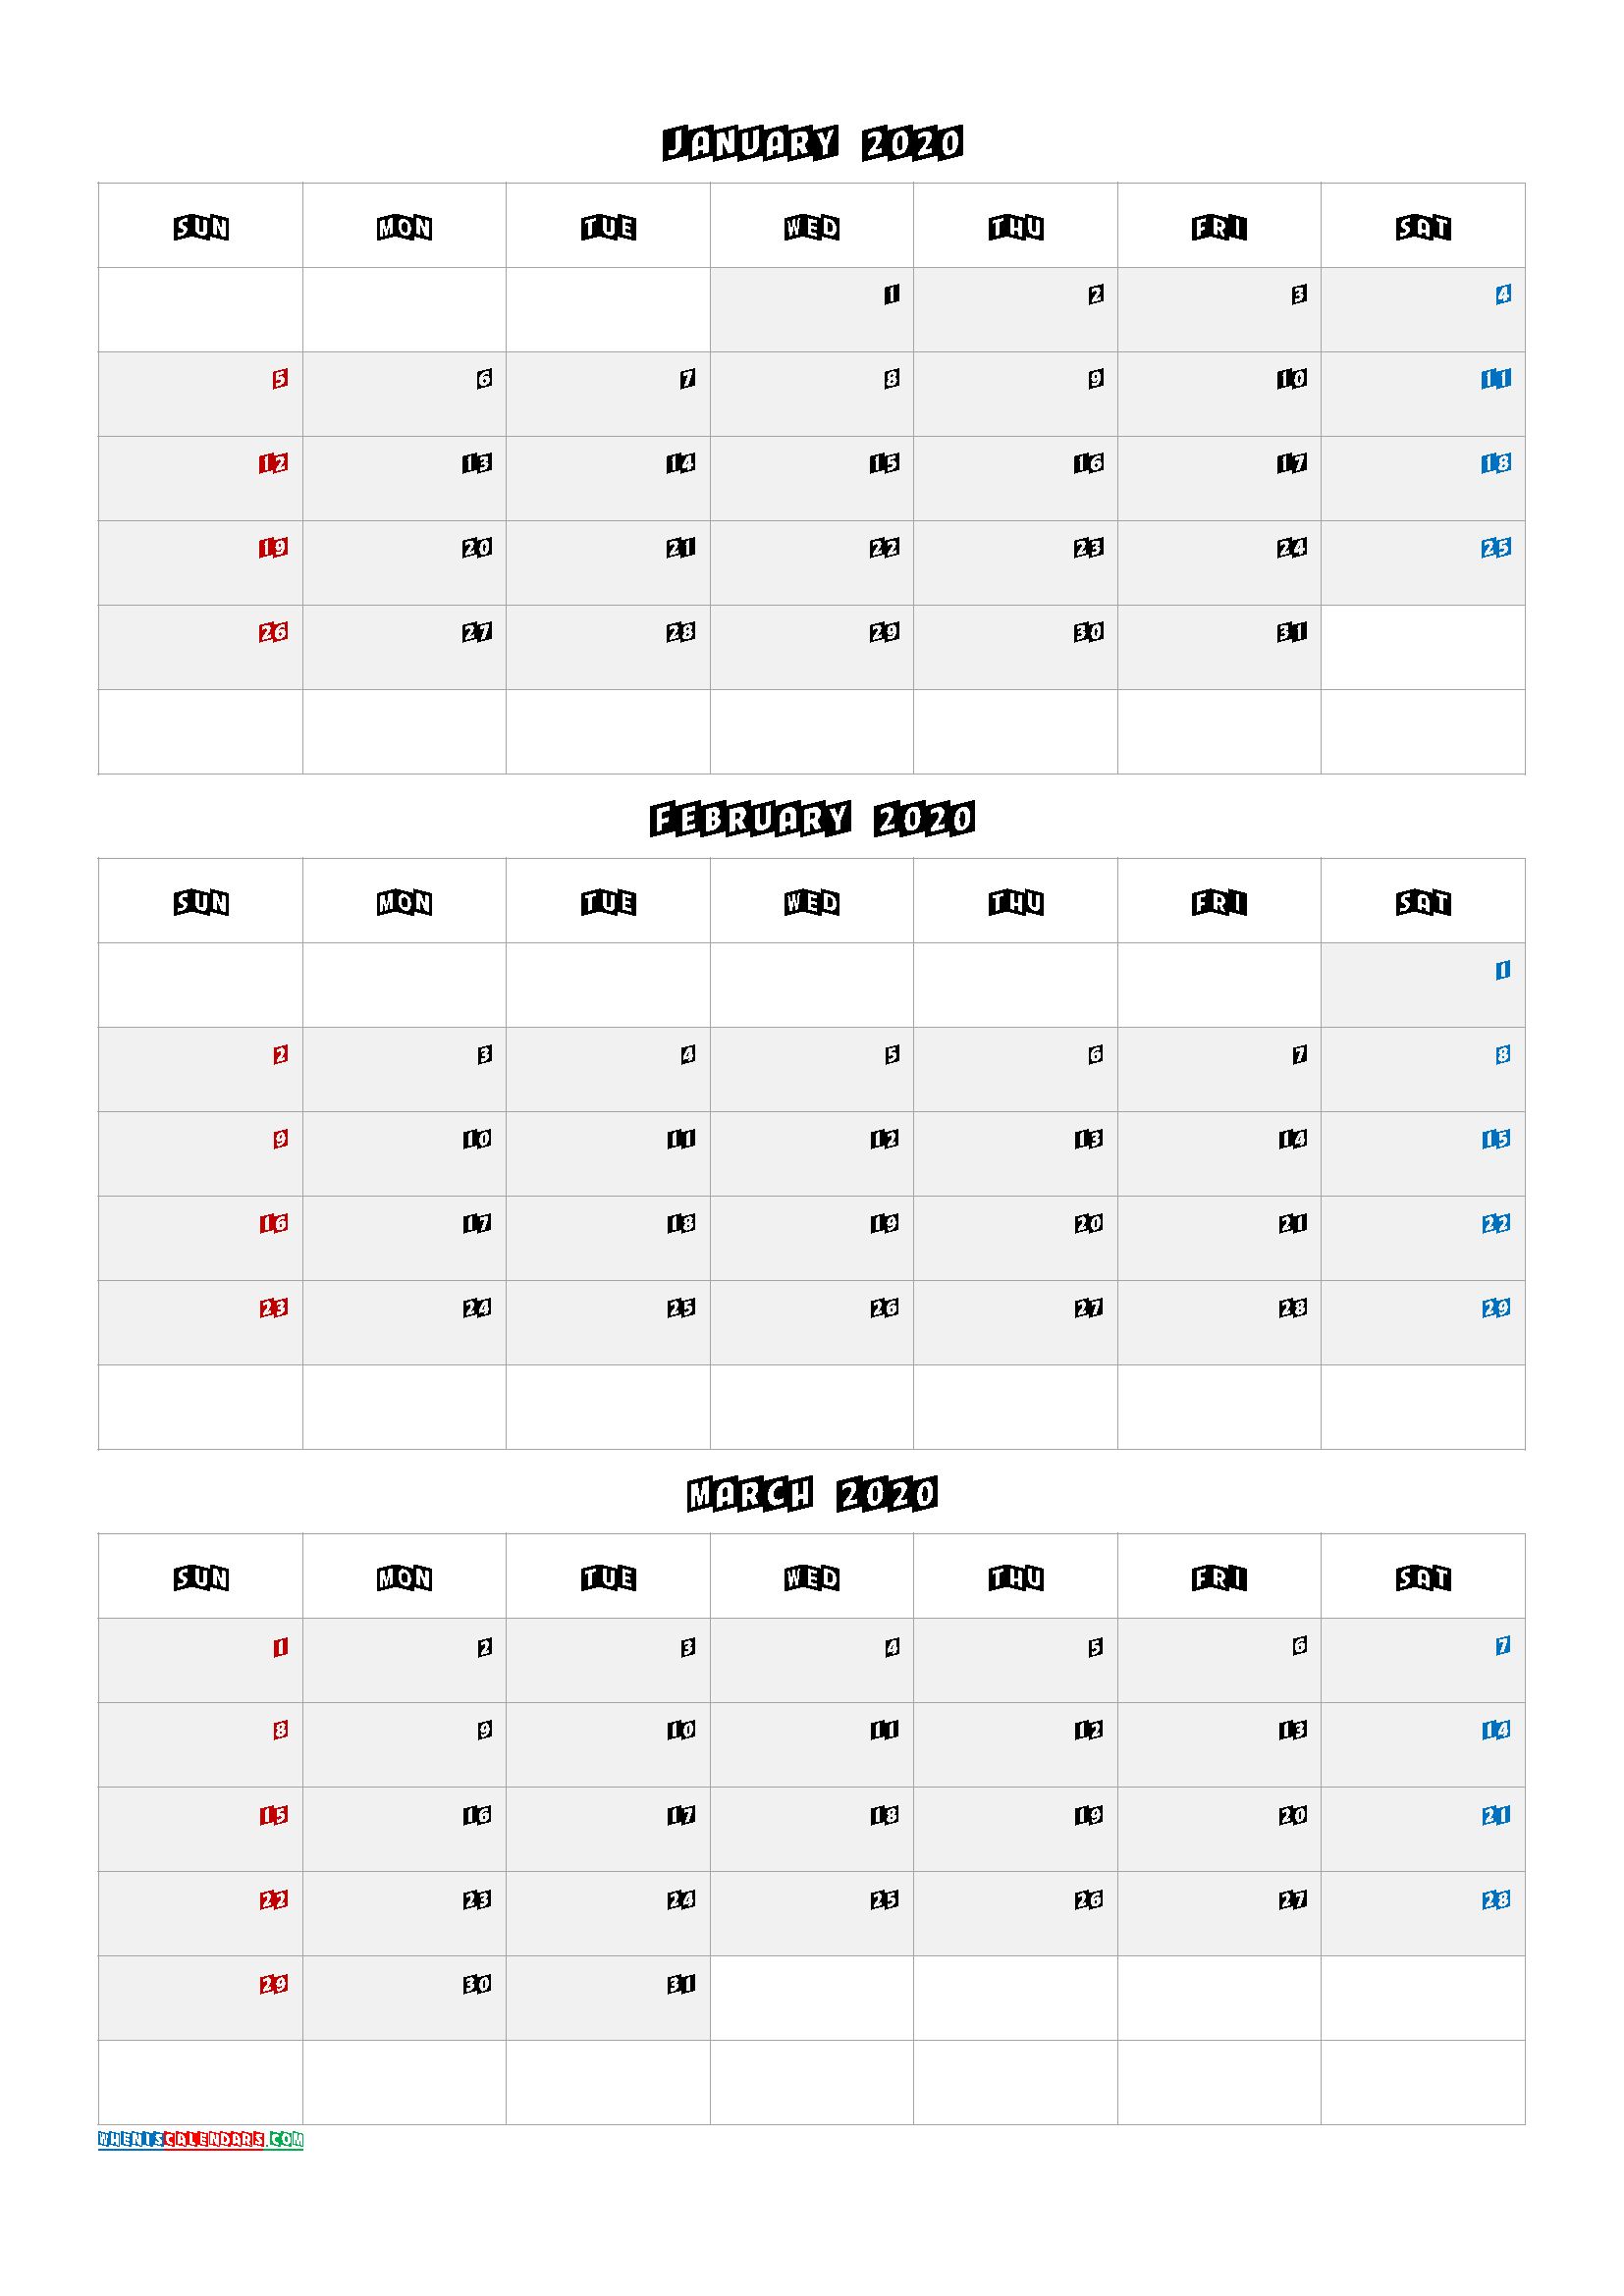 January February March Calendar In November December January February March Calendars